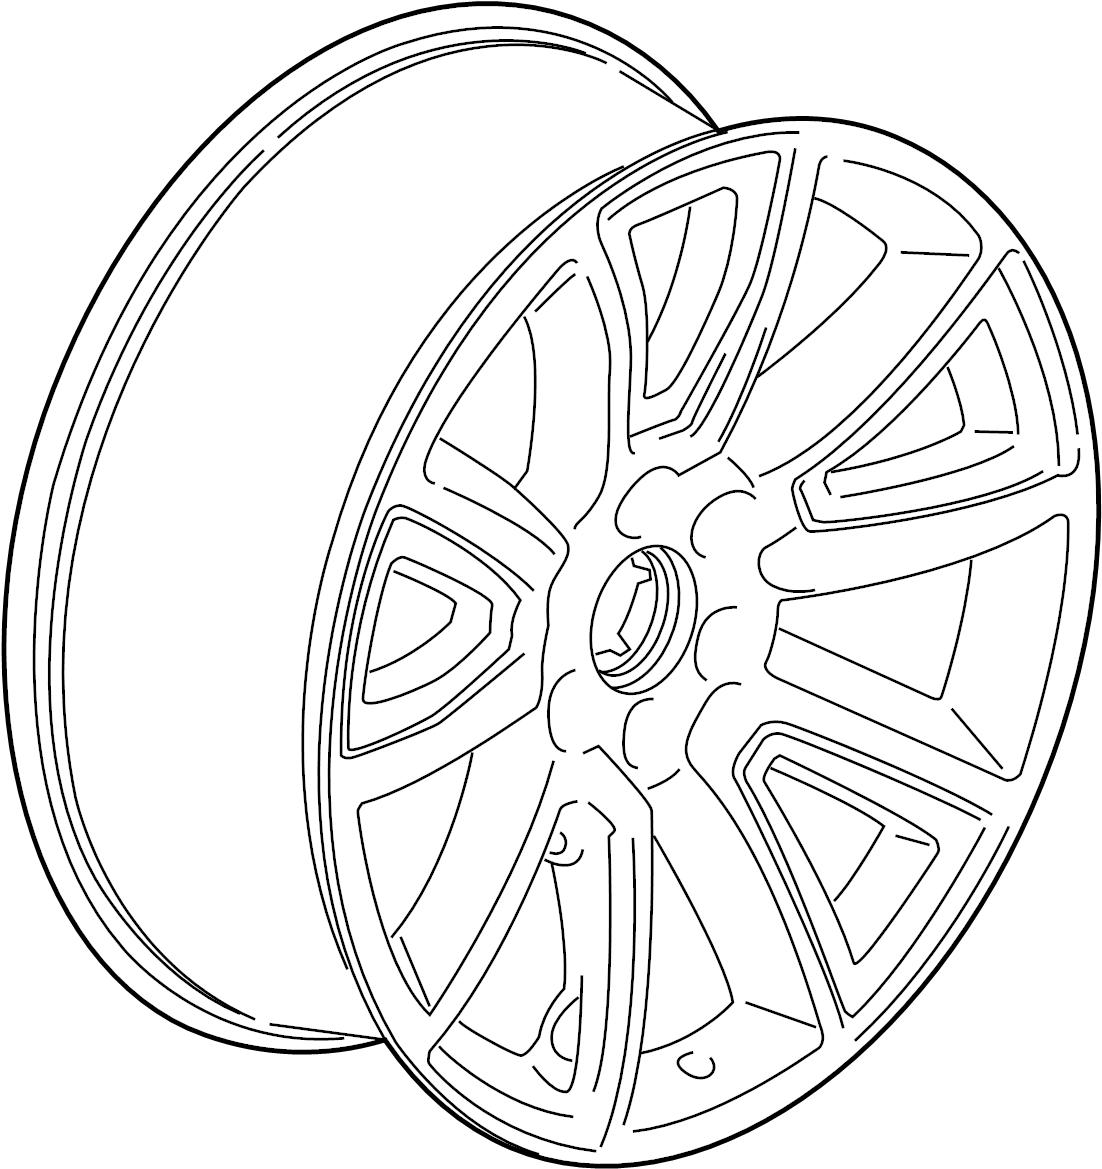 Chevrolet Silverado Wheel Package Wheel Alloy Gmc Yukon 22 Code Q7m Gmc 22 Code